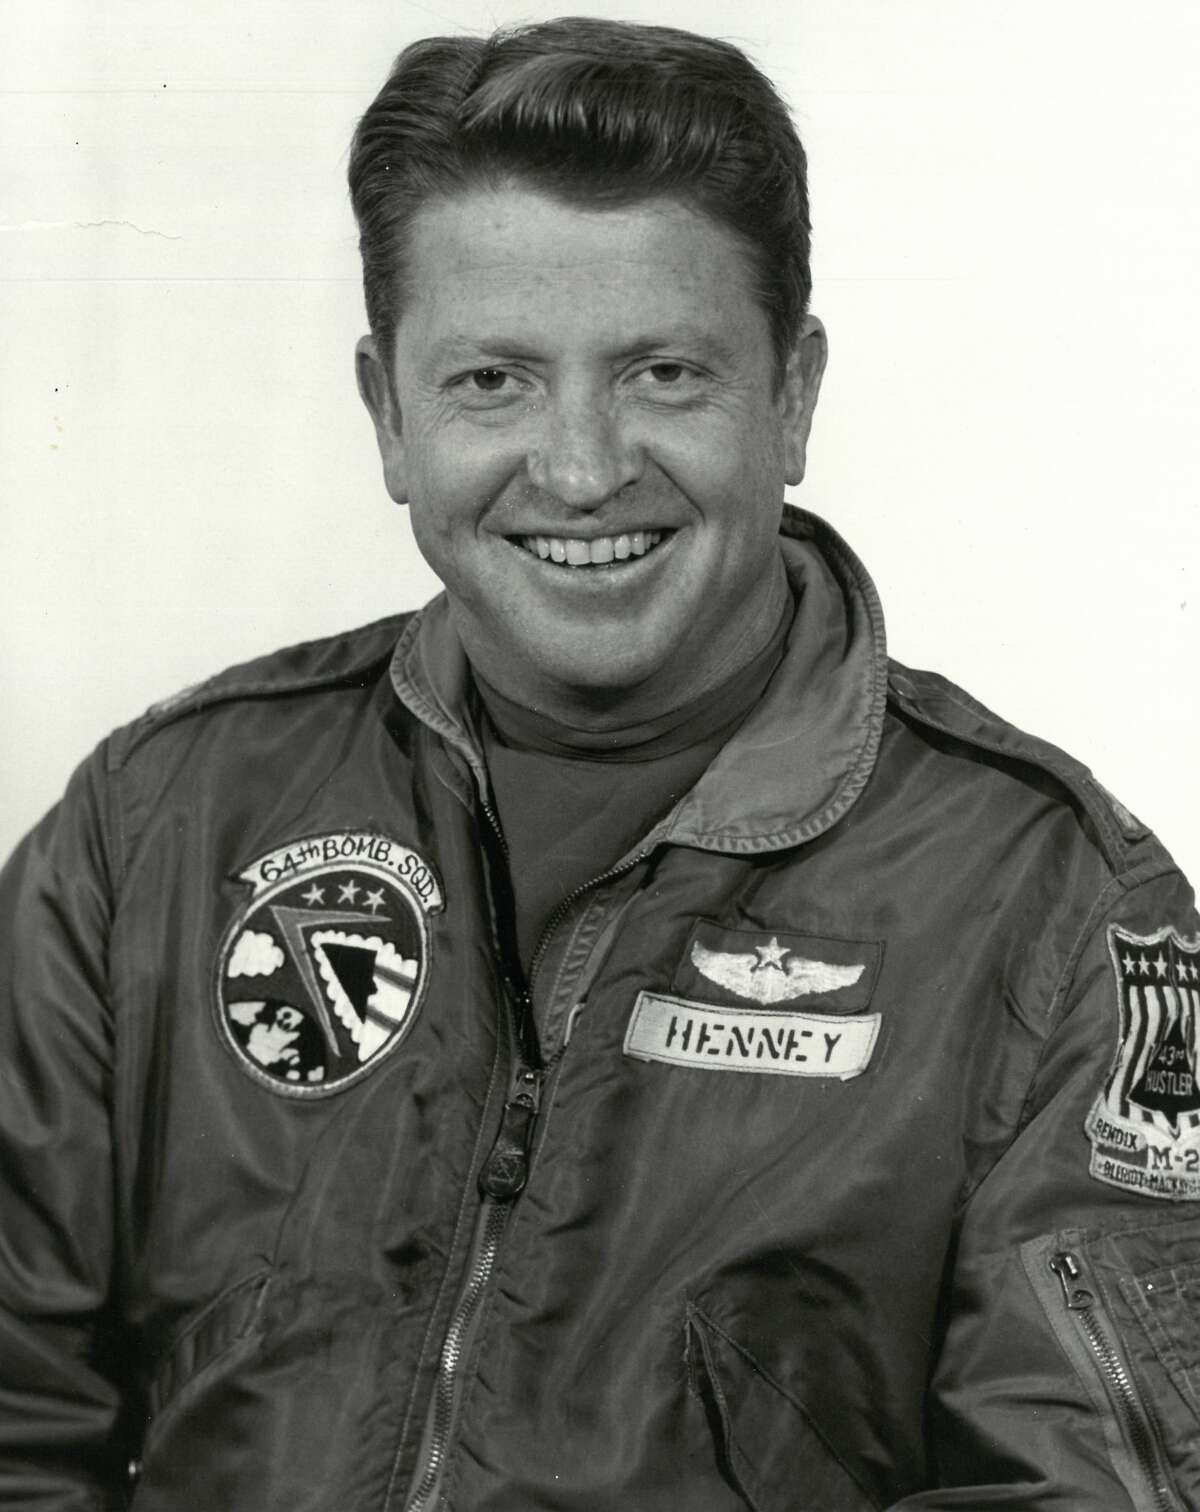 Col. Rodney B. Henney